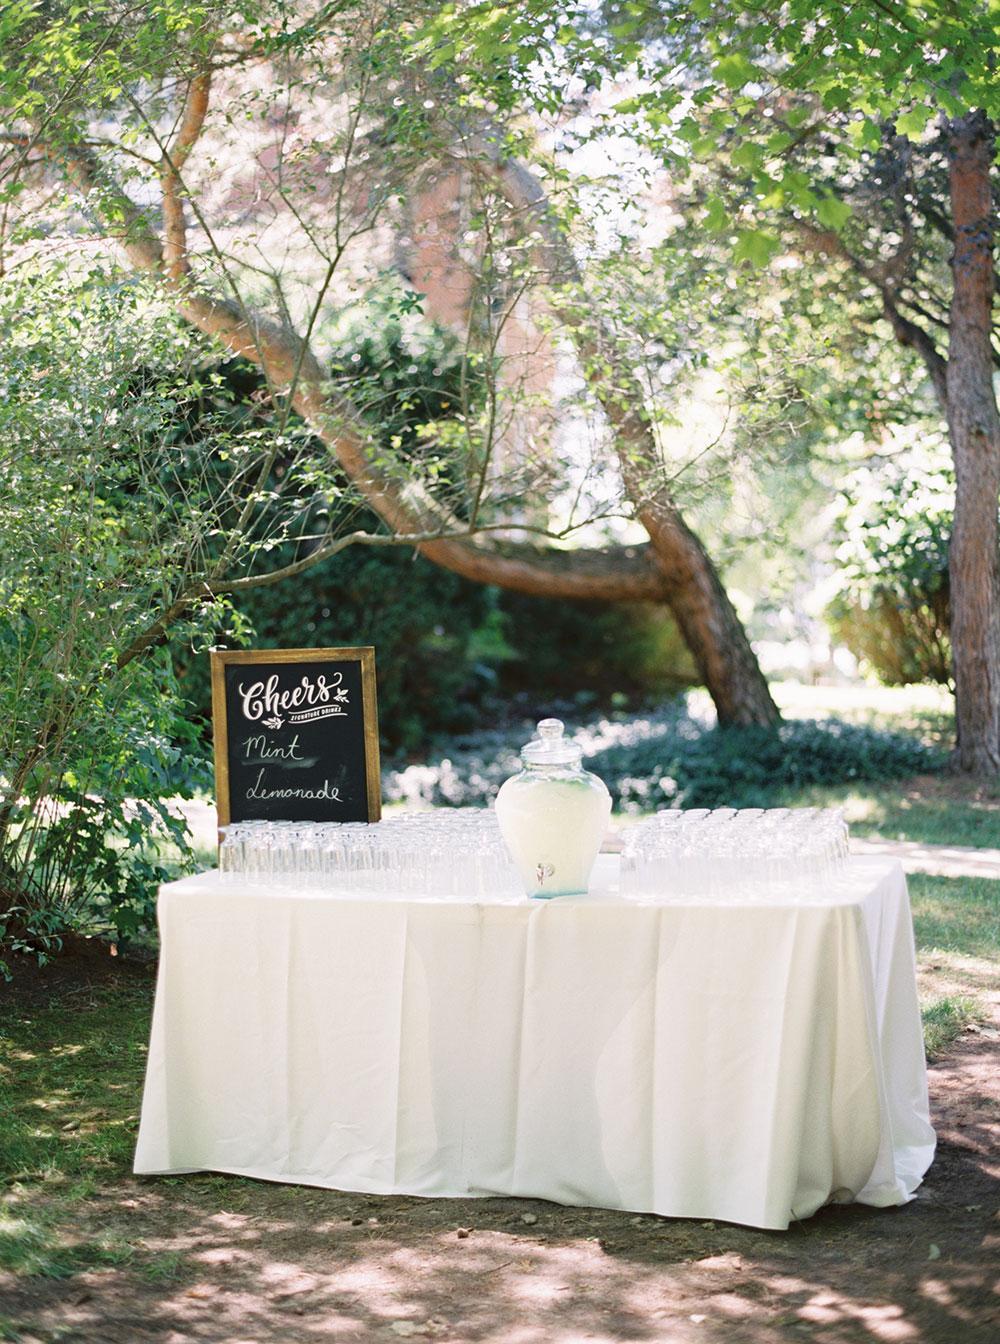 kurtz-orchards-wedding-gracewood-estate-niagara-on-the-lake-photo-by-katie-nicolle-photography-0014.JPG